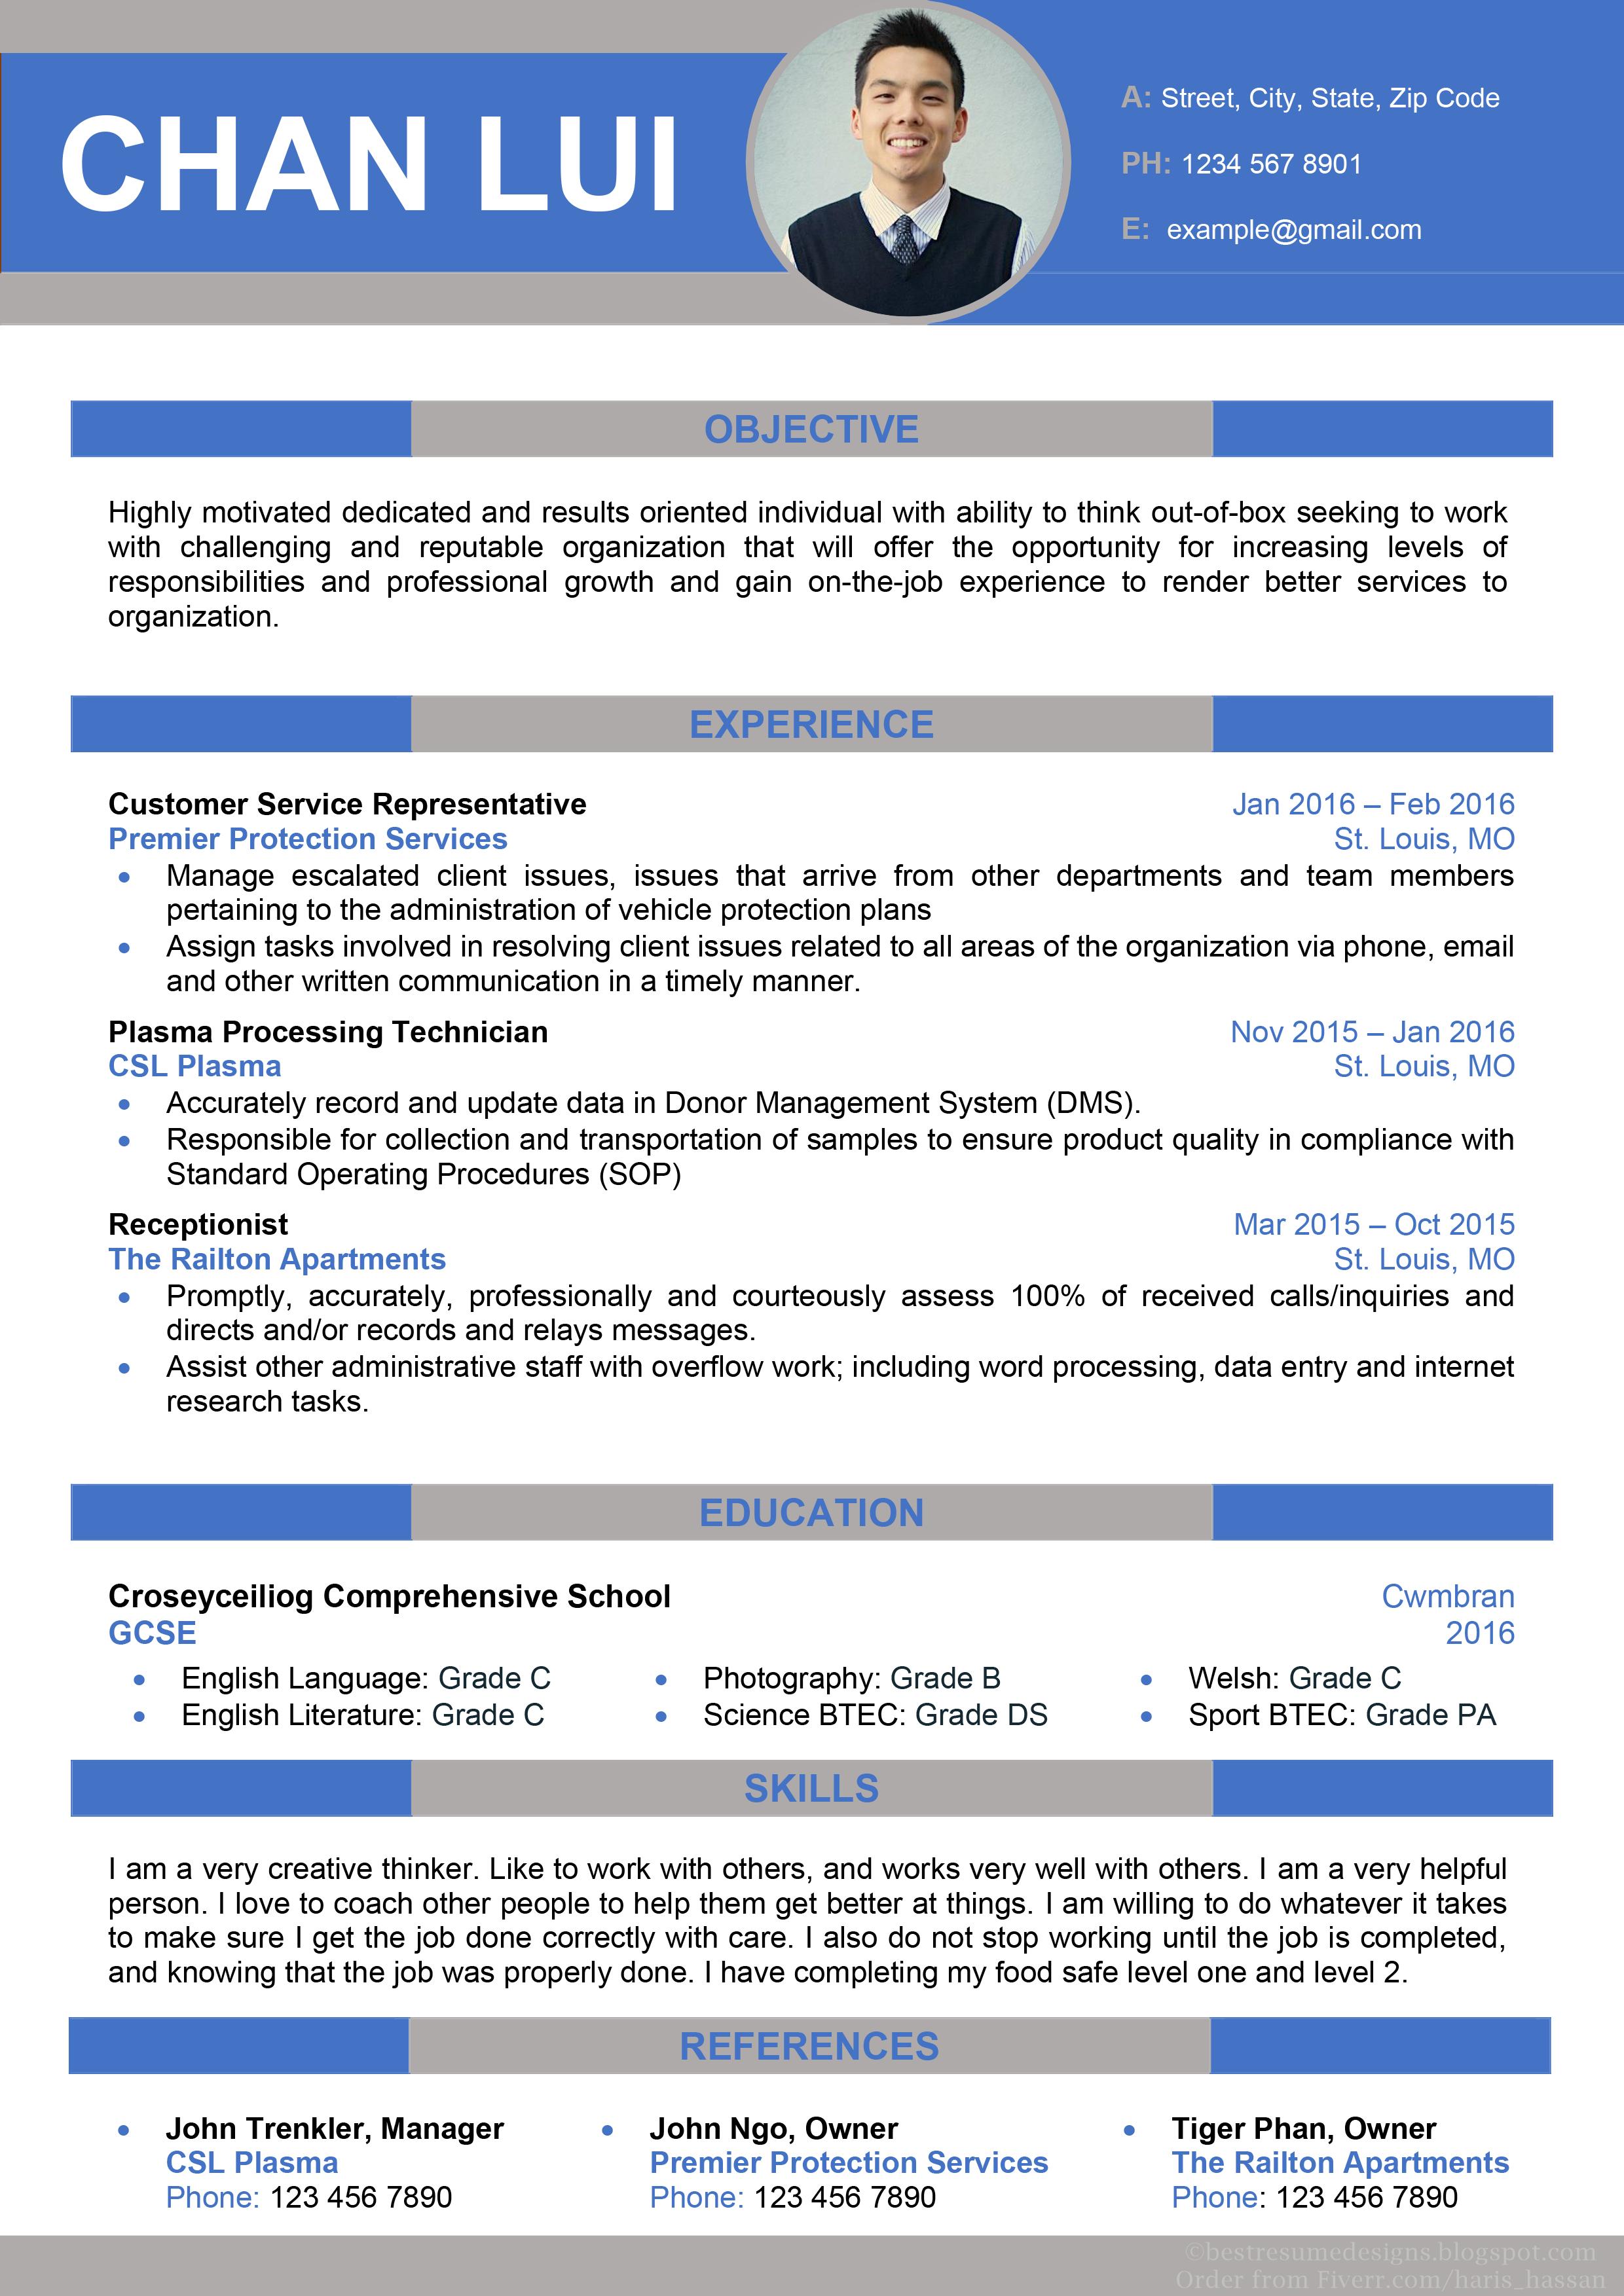 Cv Design No 11 Cv Design Resume Design Cv Examples